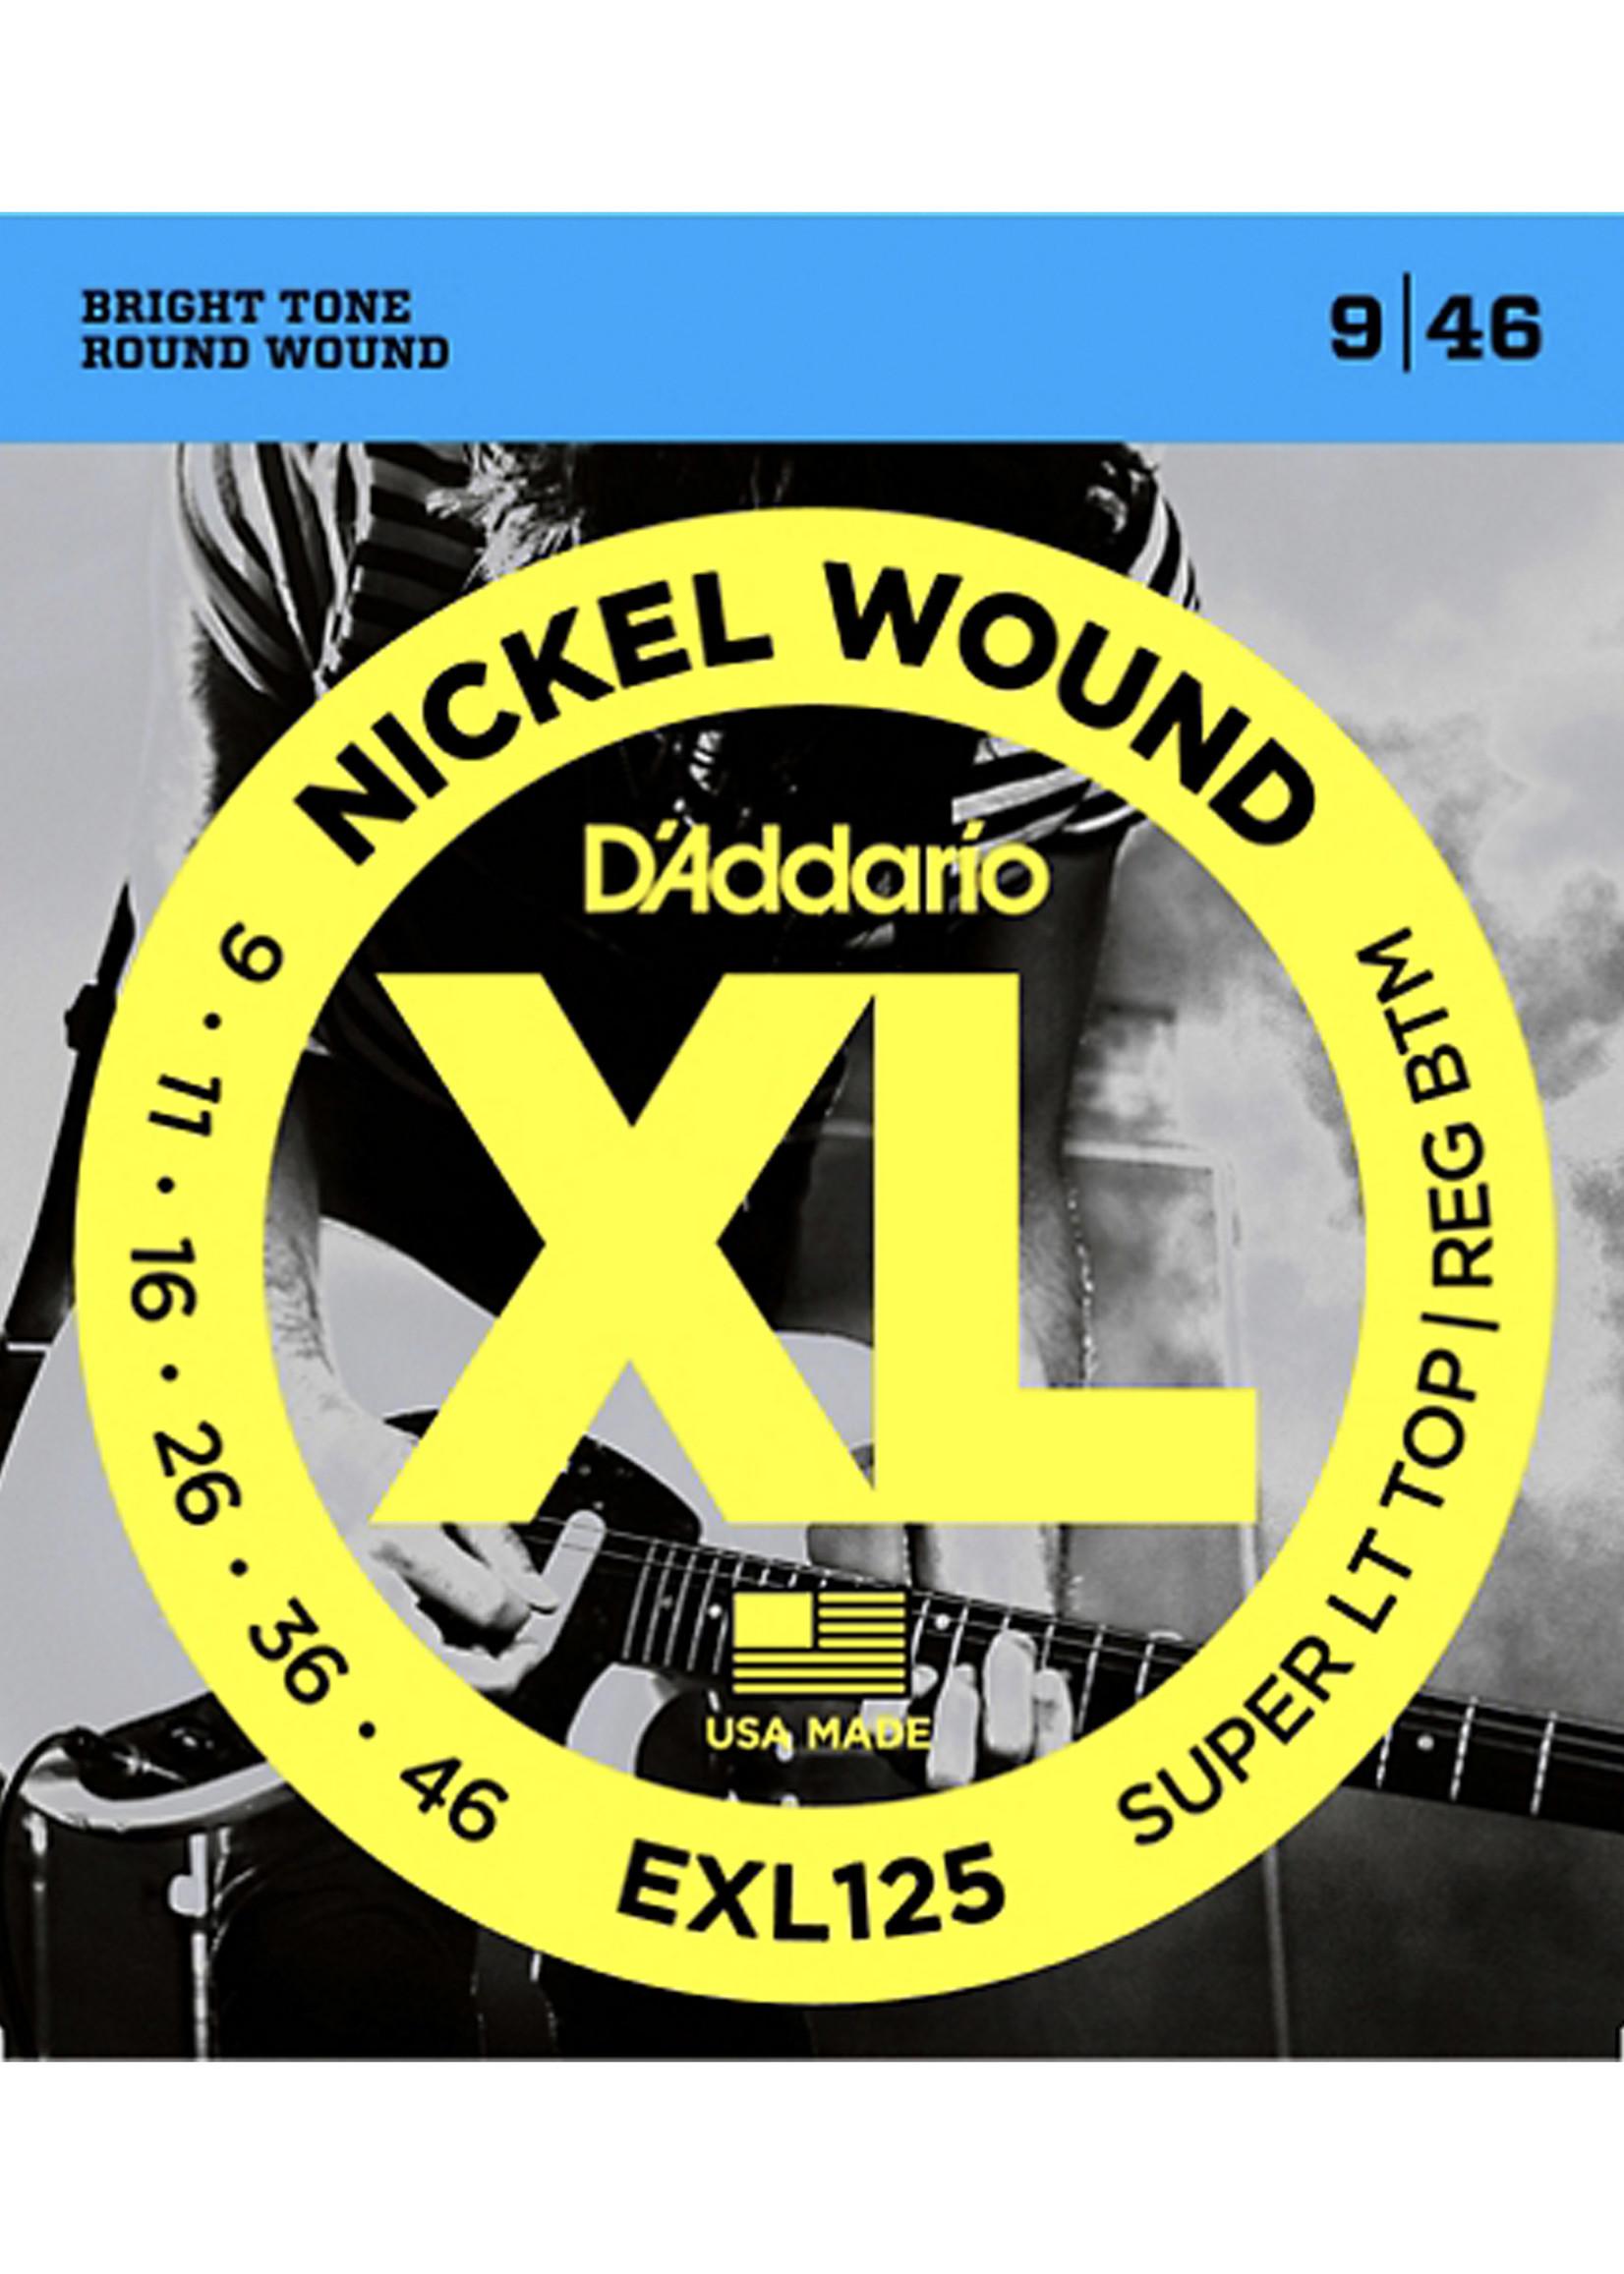 DAddario Fretted D'Addario EXL125 9-46